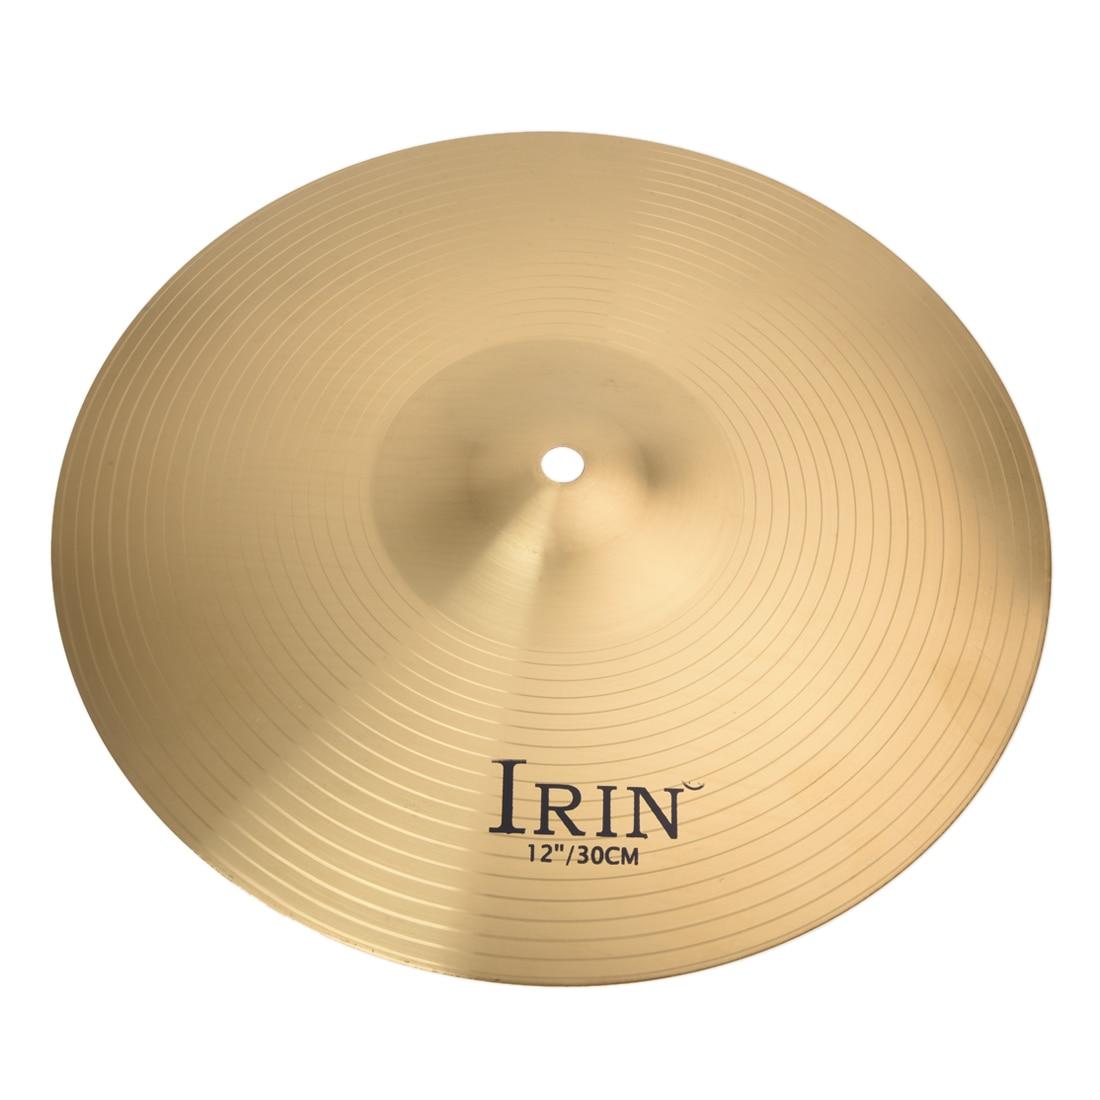 IRIN High Quality 12